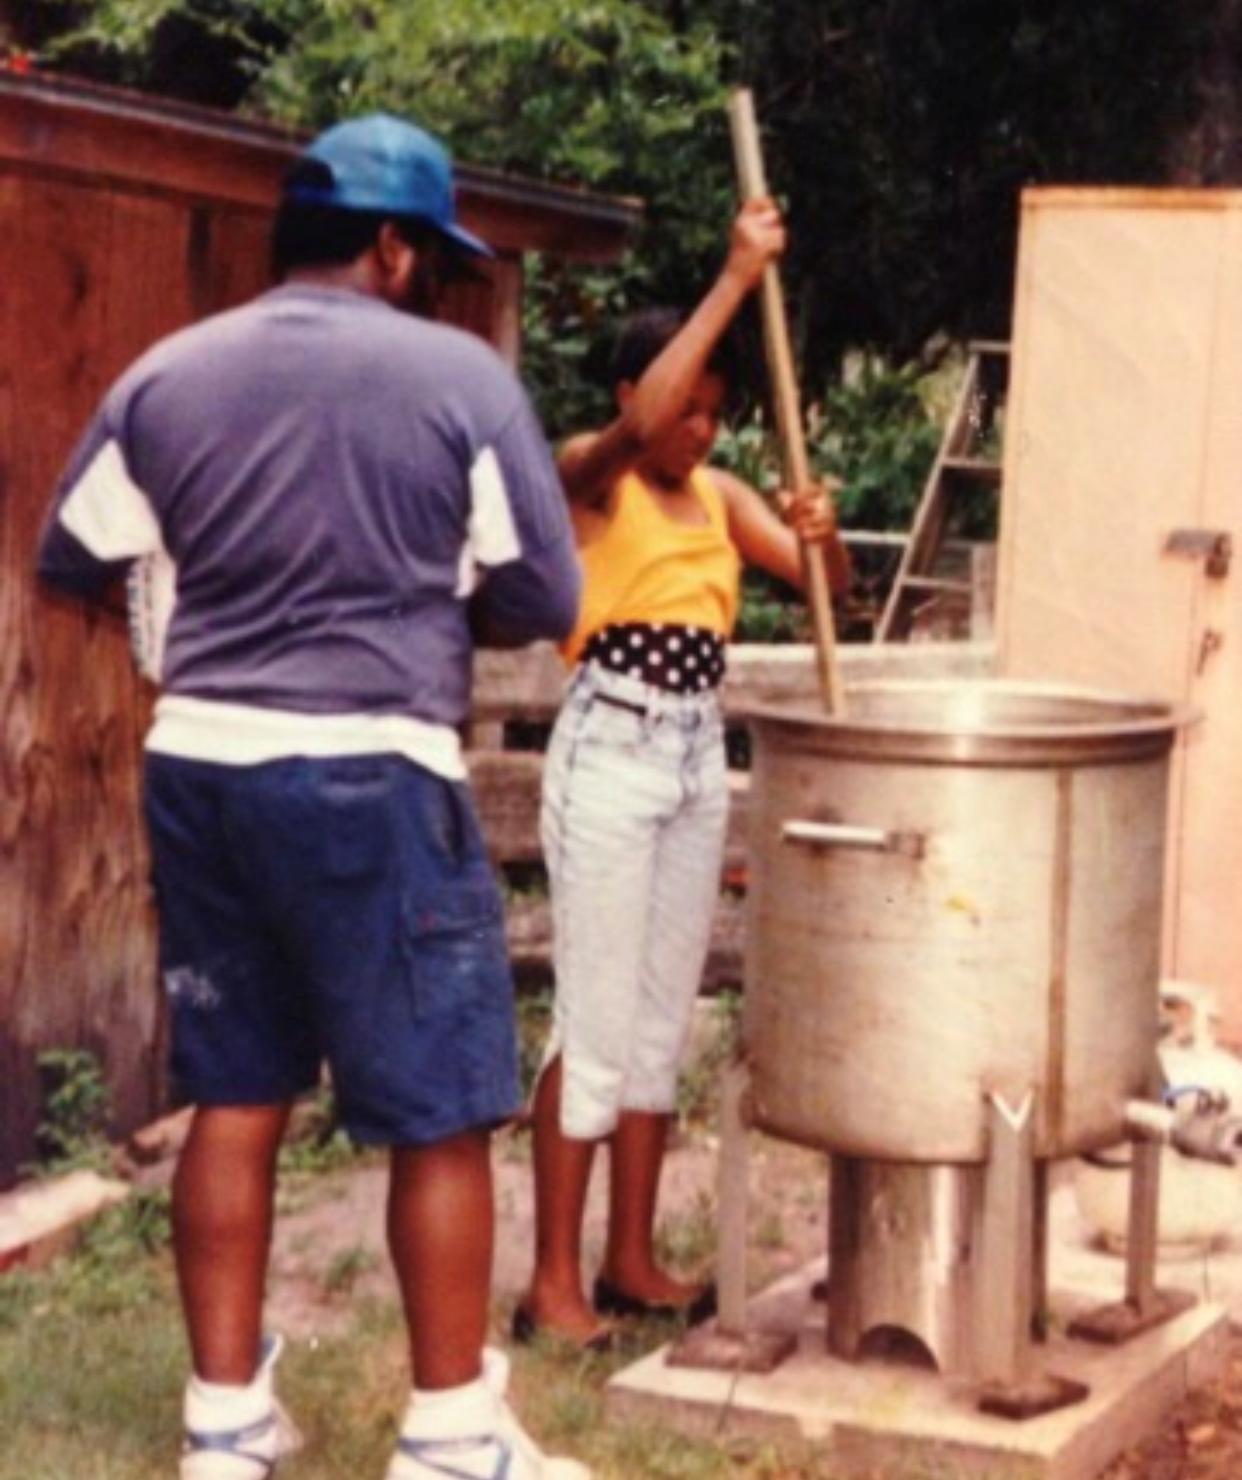 KiKi's very first Kountry Boil in Palatka, Florida